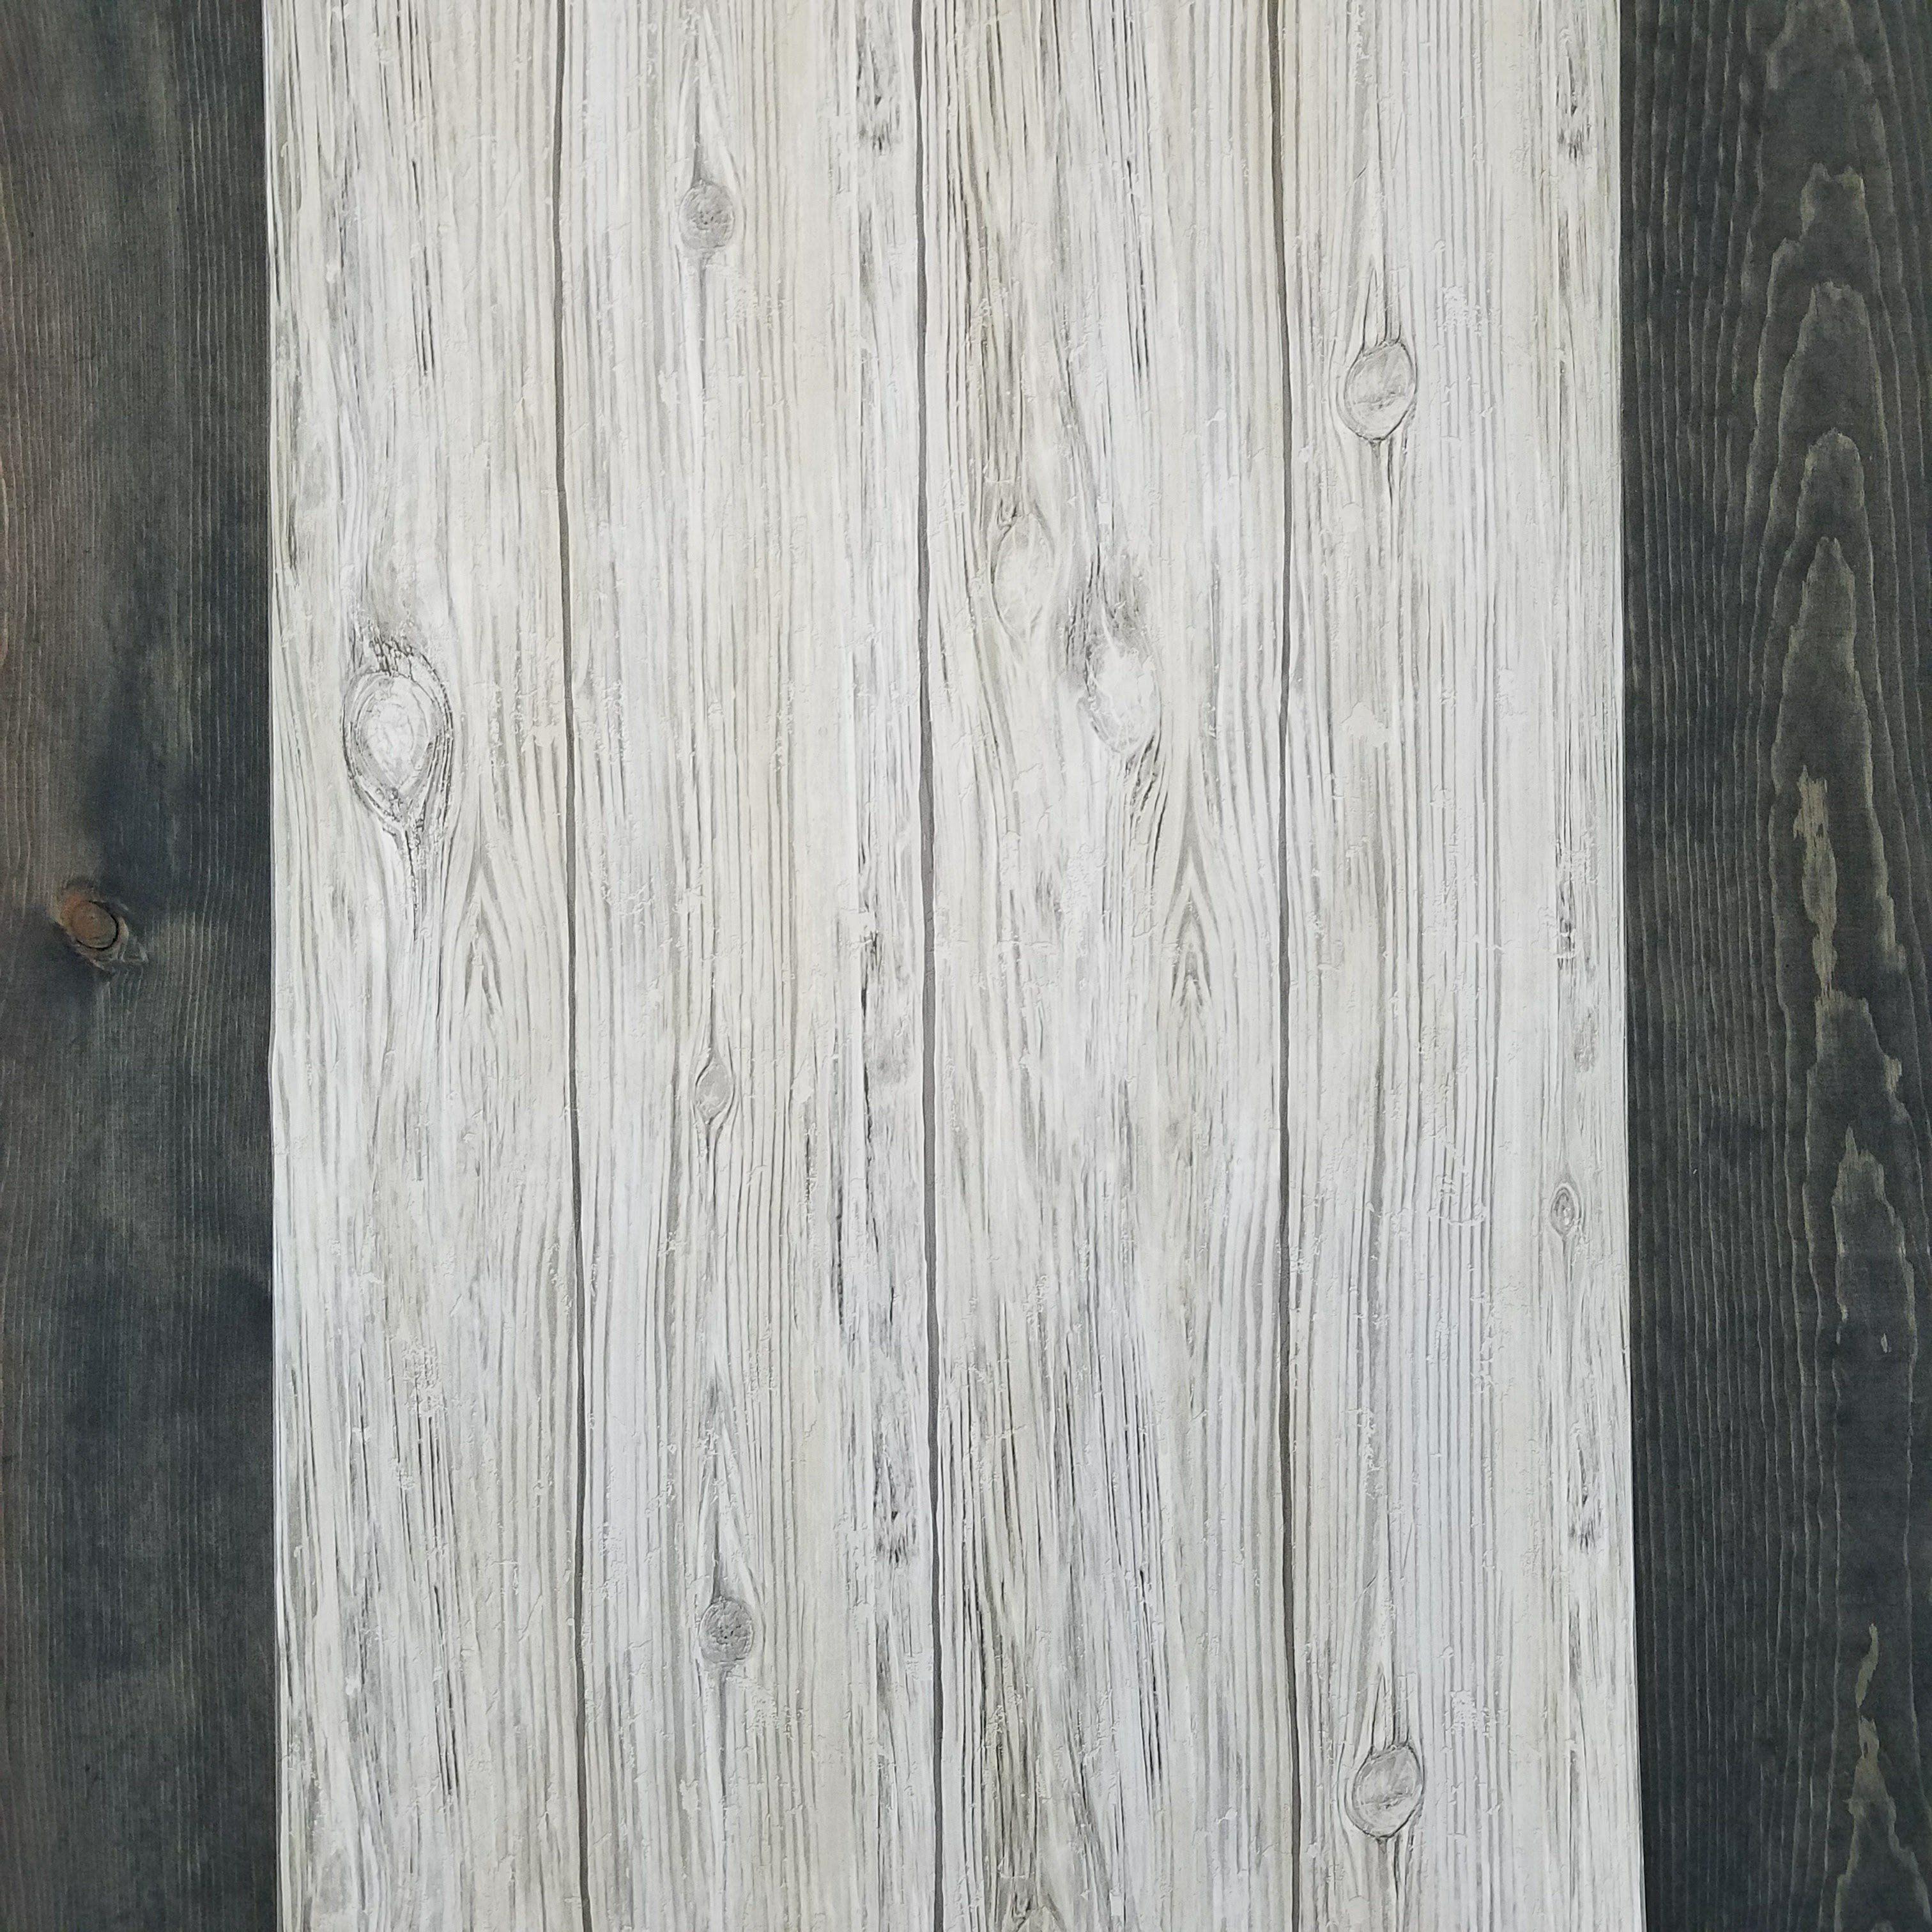 Gray Distressed Shiplap Rustic Wood Peel And Stick Wallpaper Rustic Wood White Wood Wallpaper Peel And Stick Wallpaper